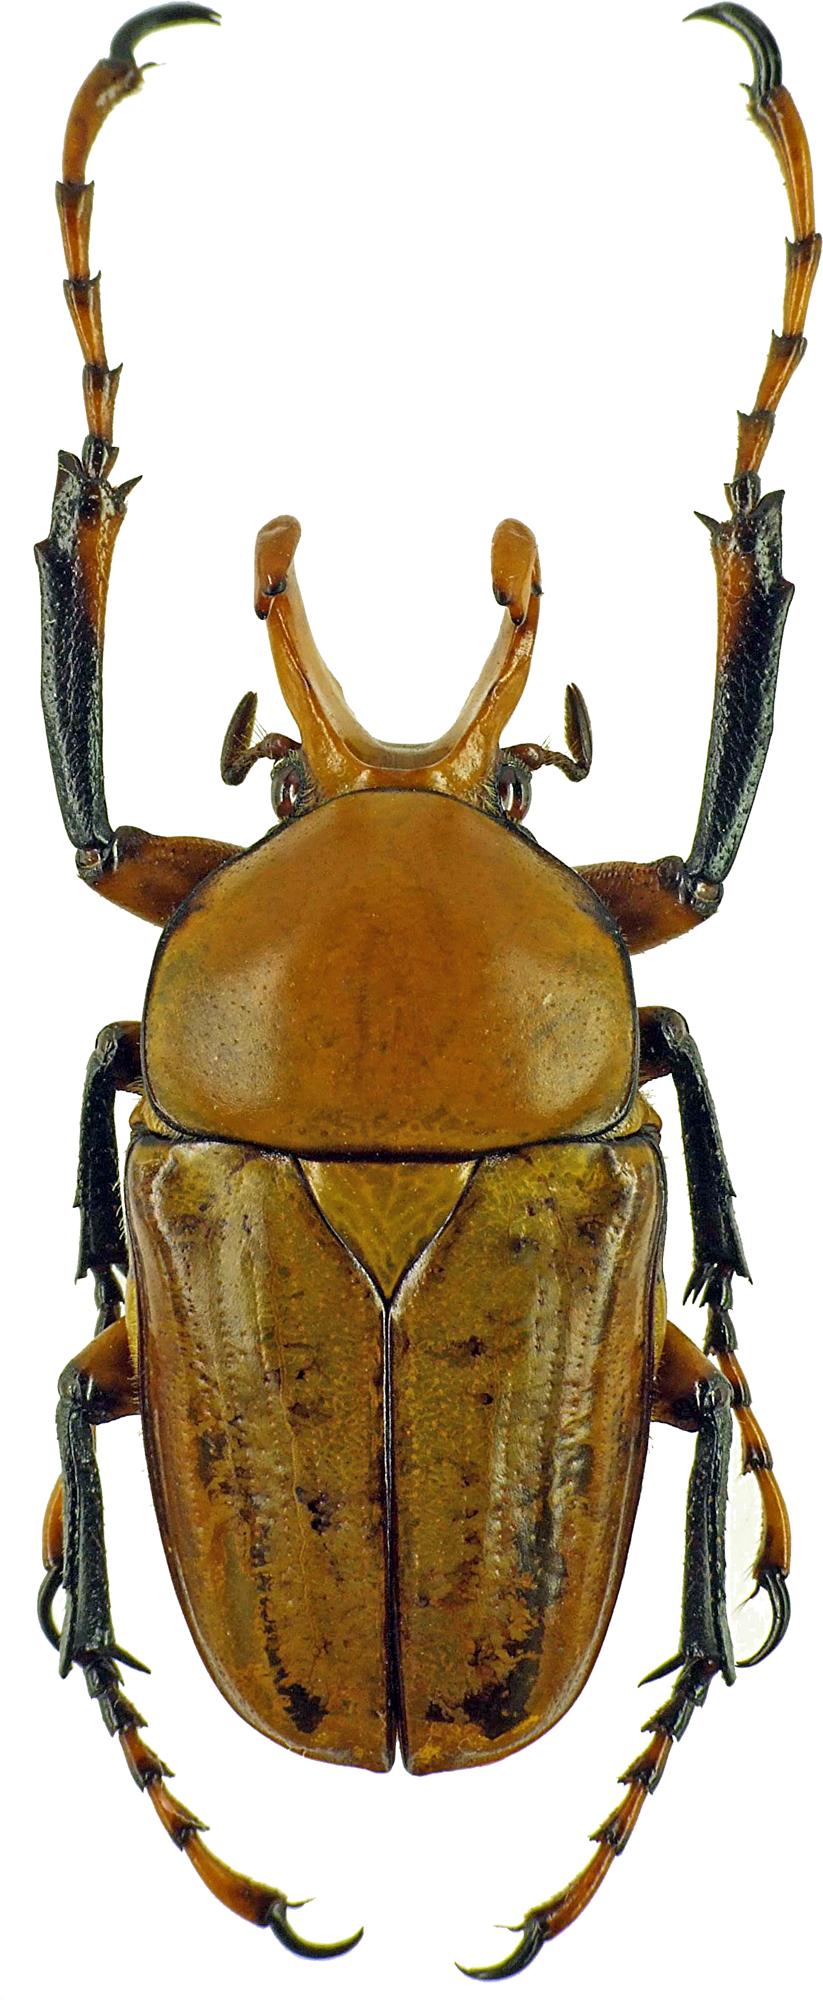 Platynocephalus miyashitai 7269cz72.jpg